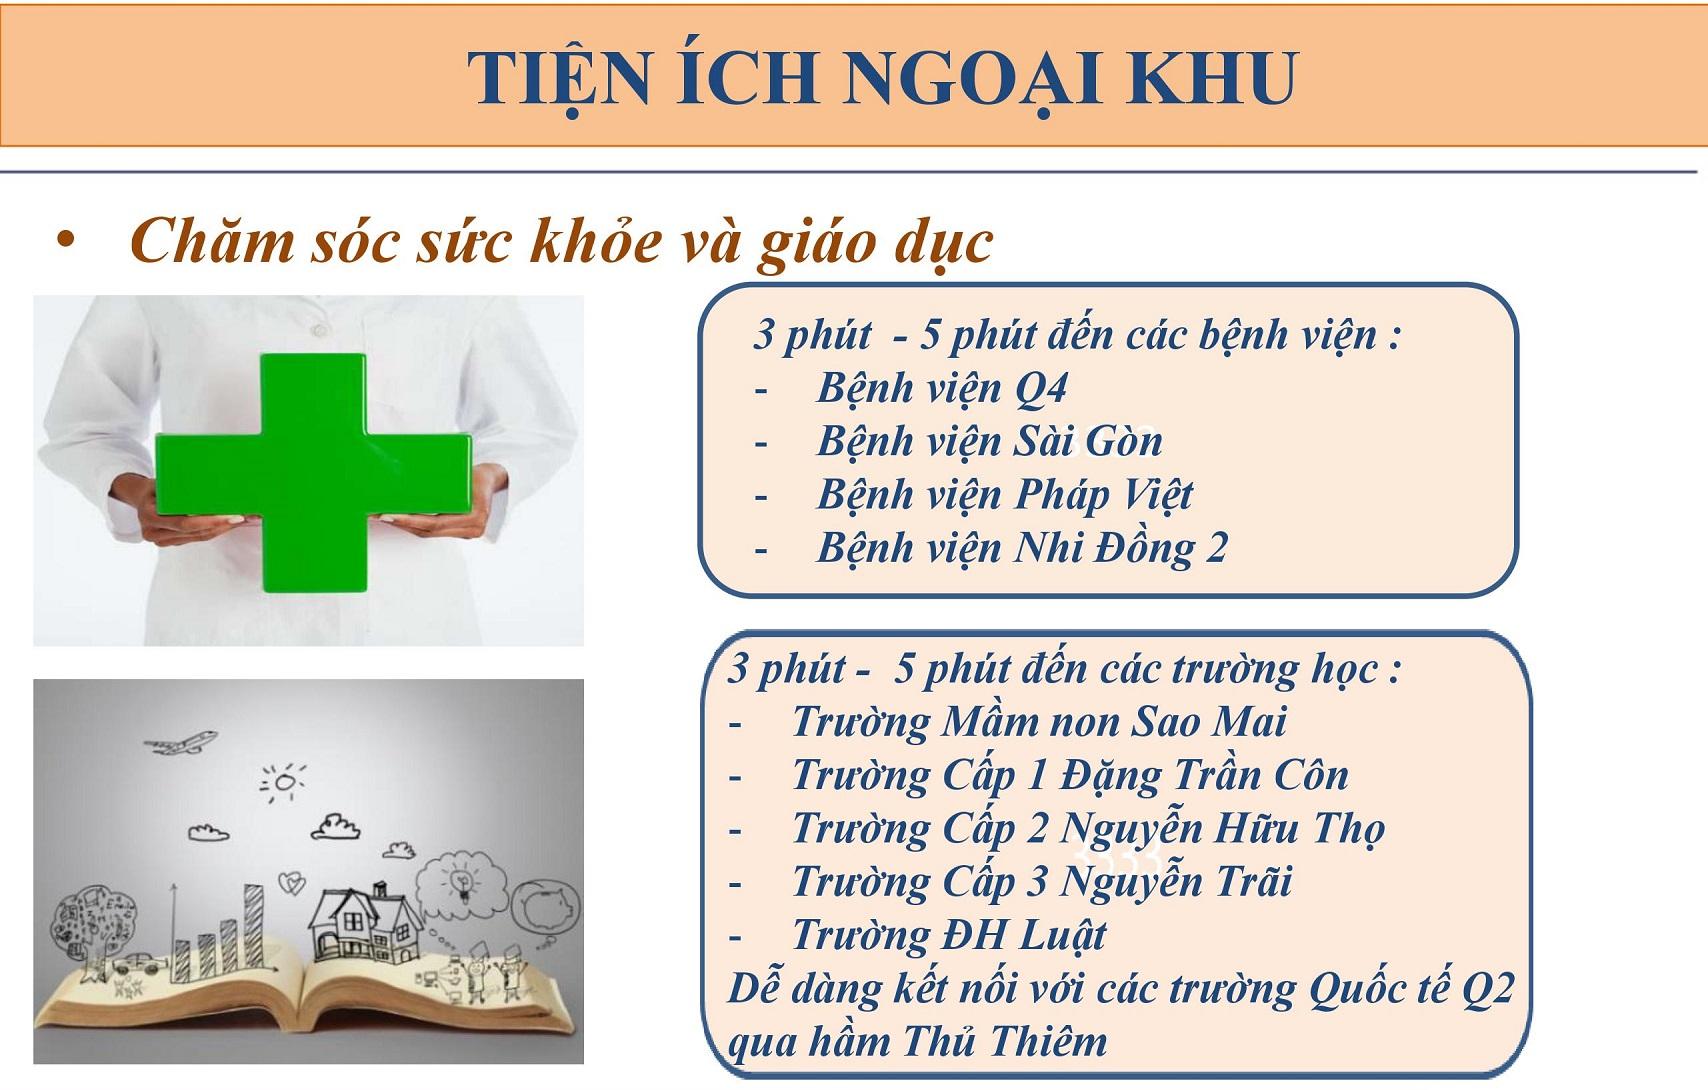 tien-ich-ngoai-khu-saigon-royal-1